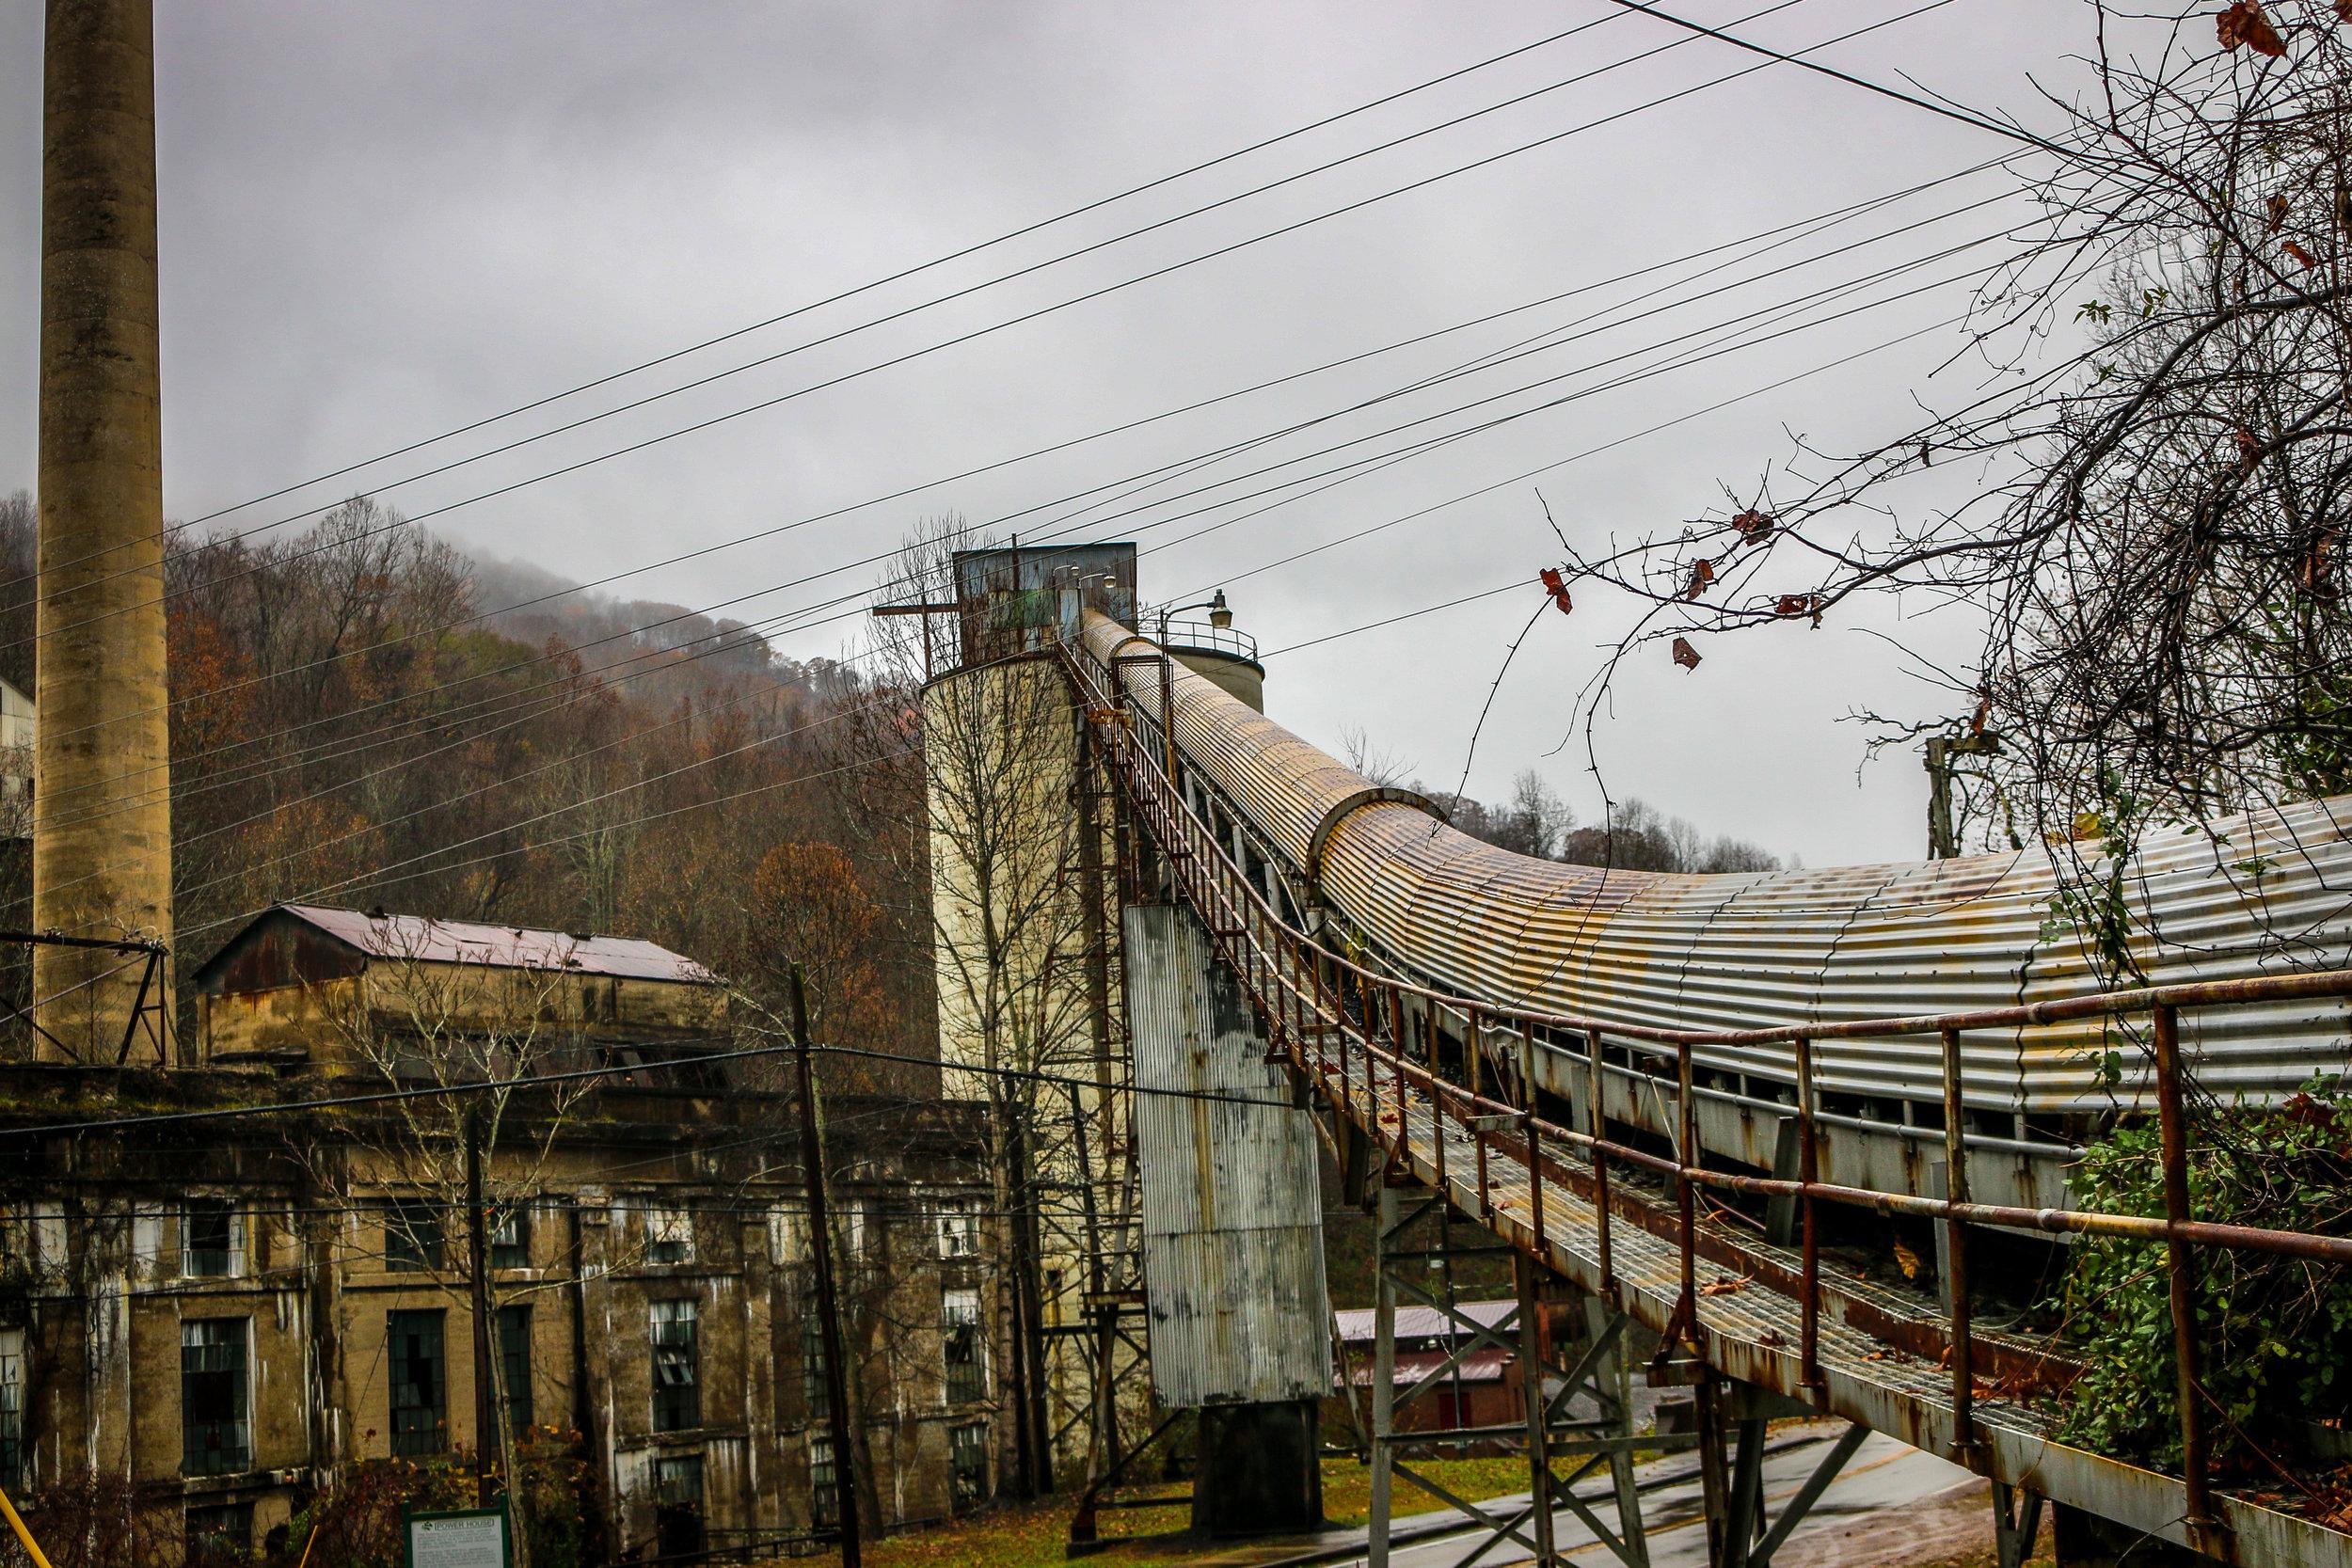 Coal Tipple in Lynch, KY